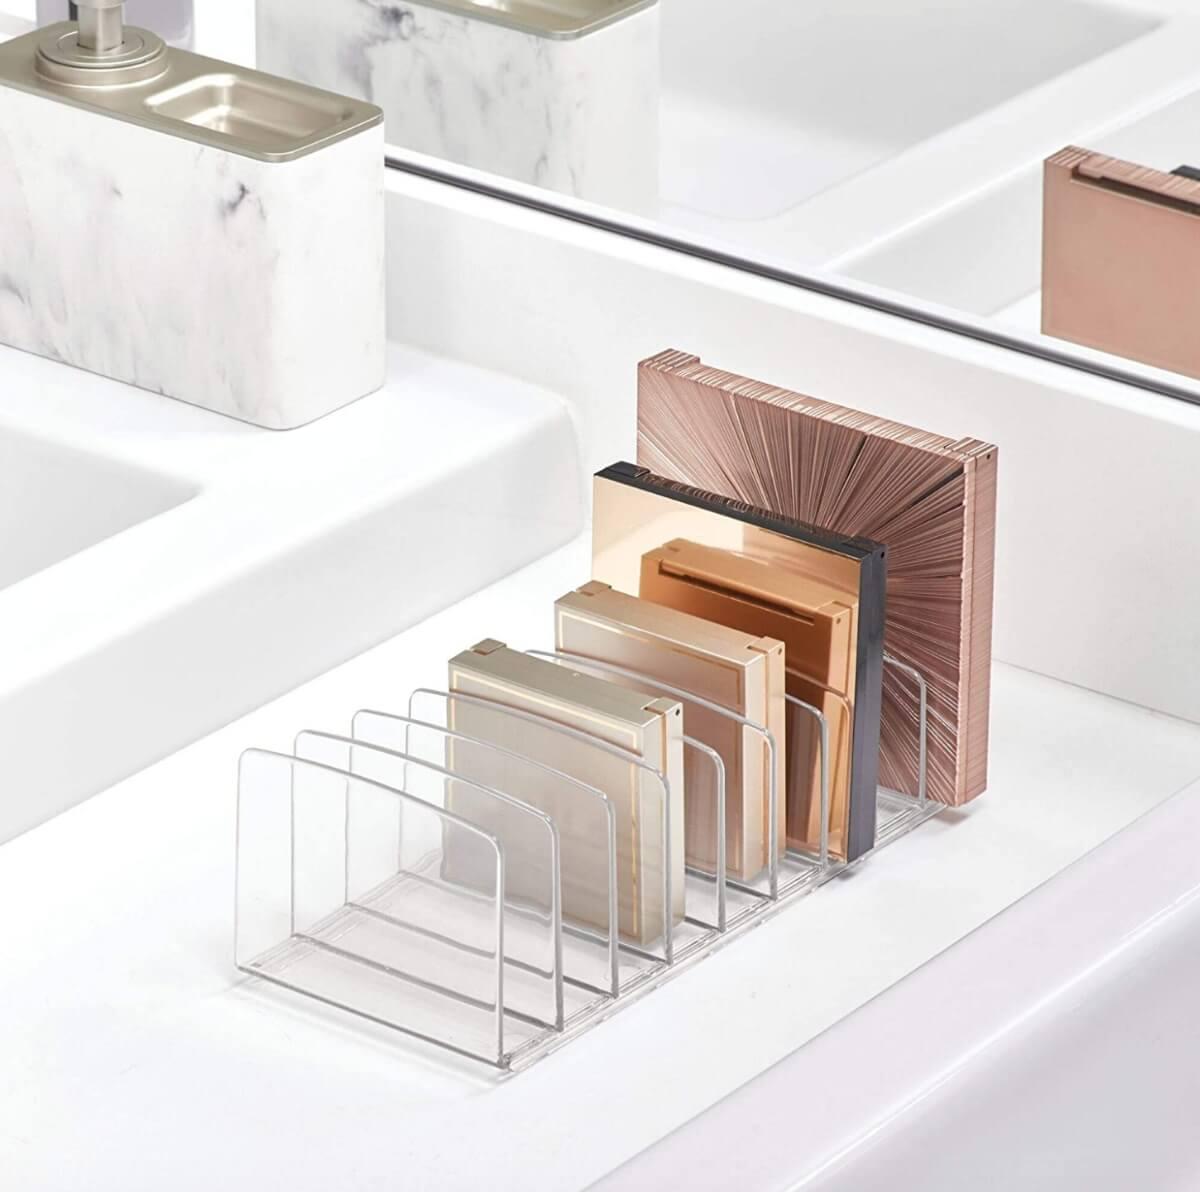 idesign acrylic makeup palette beauty organizer